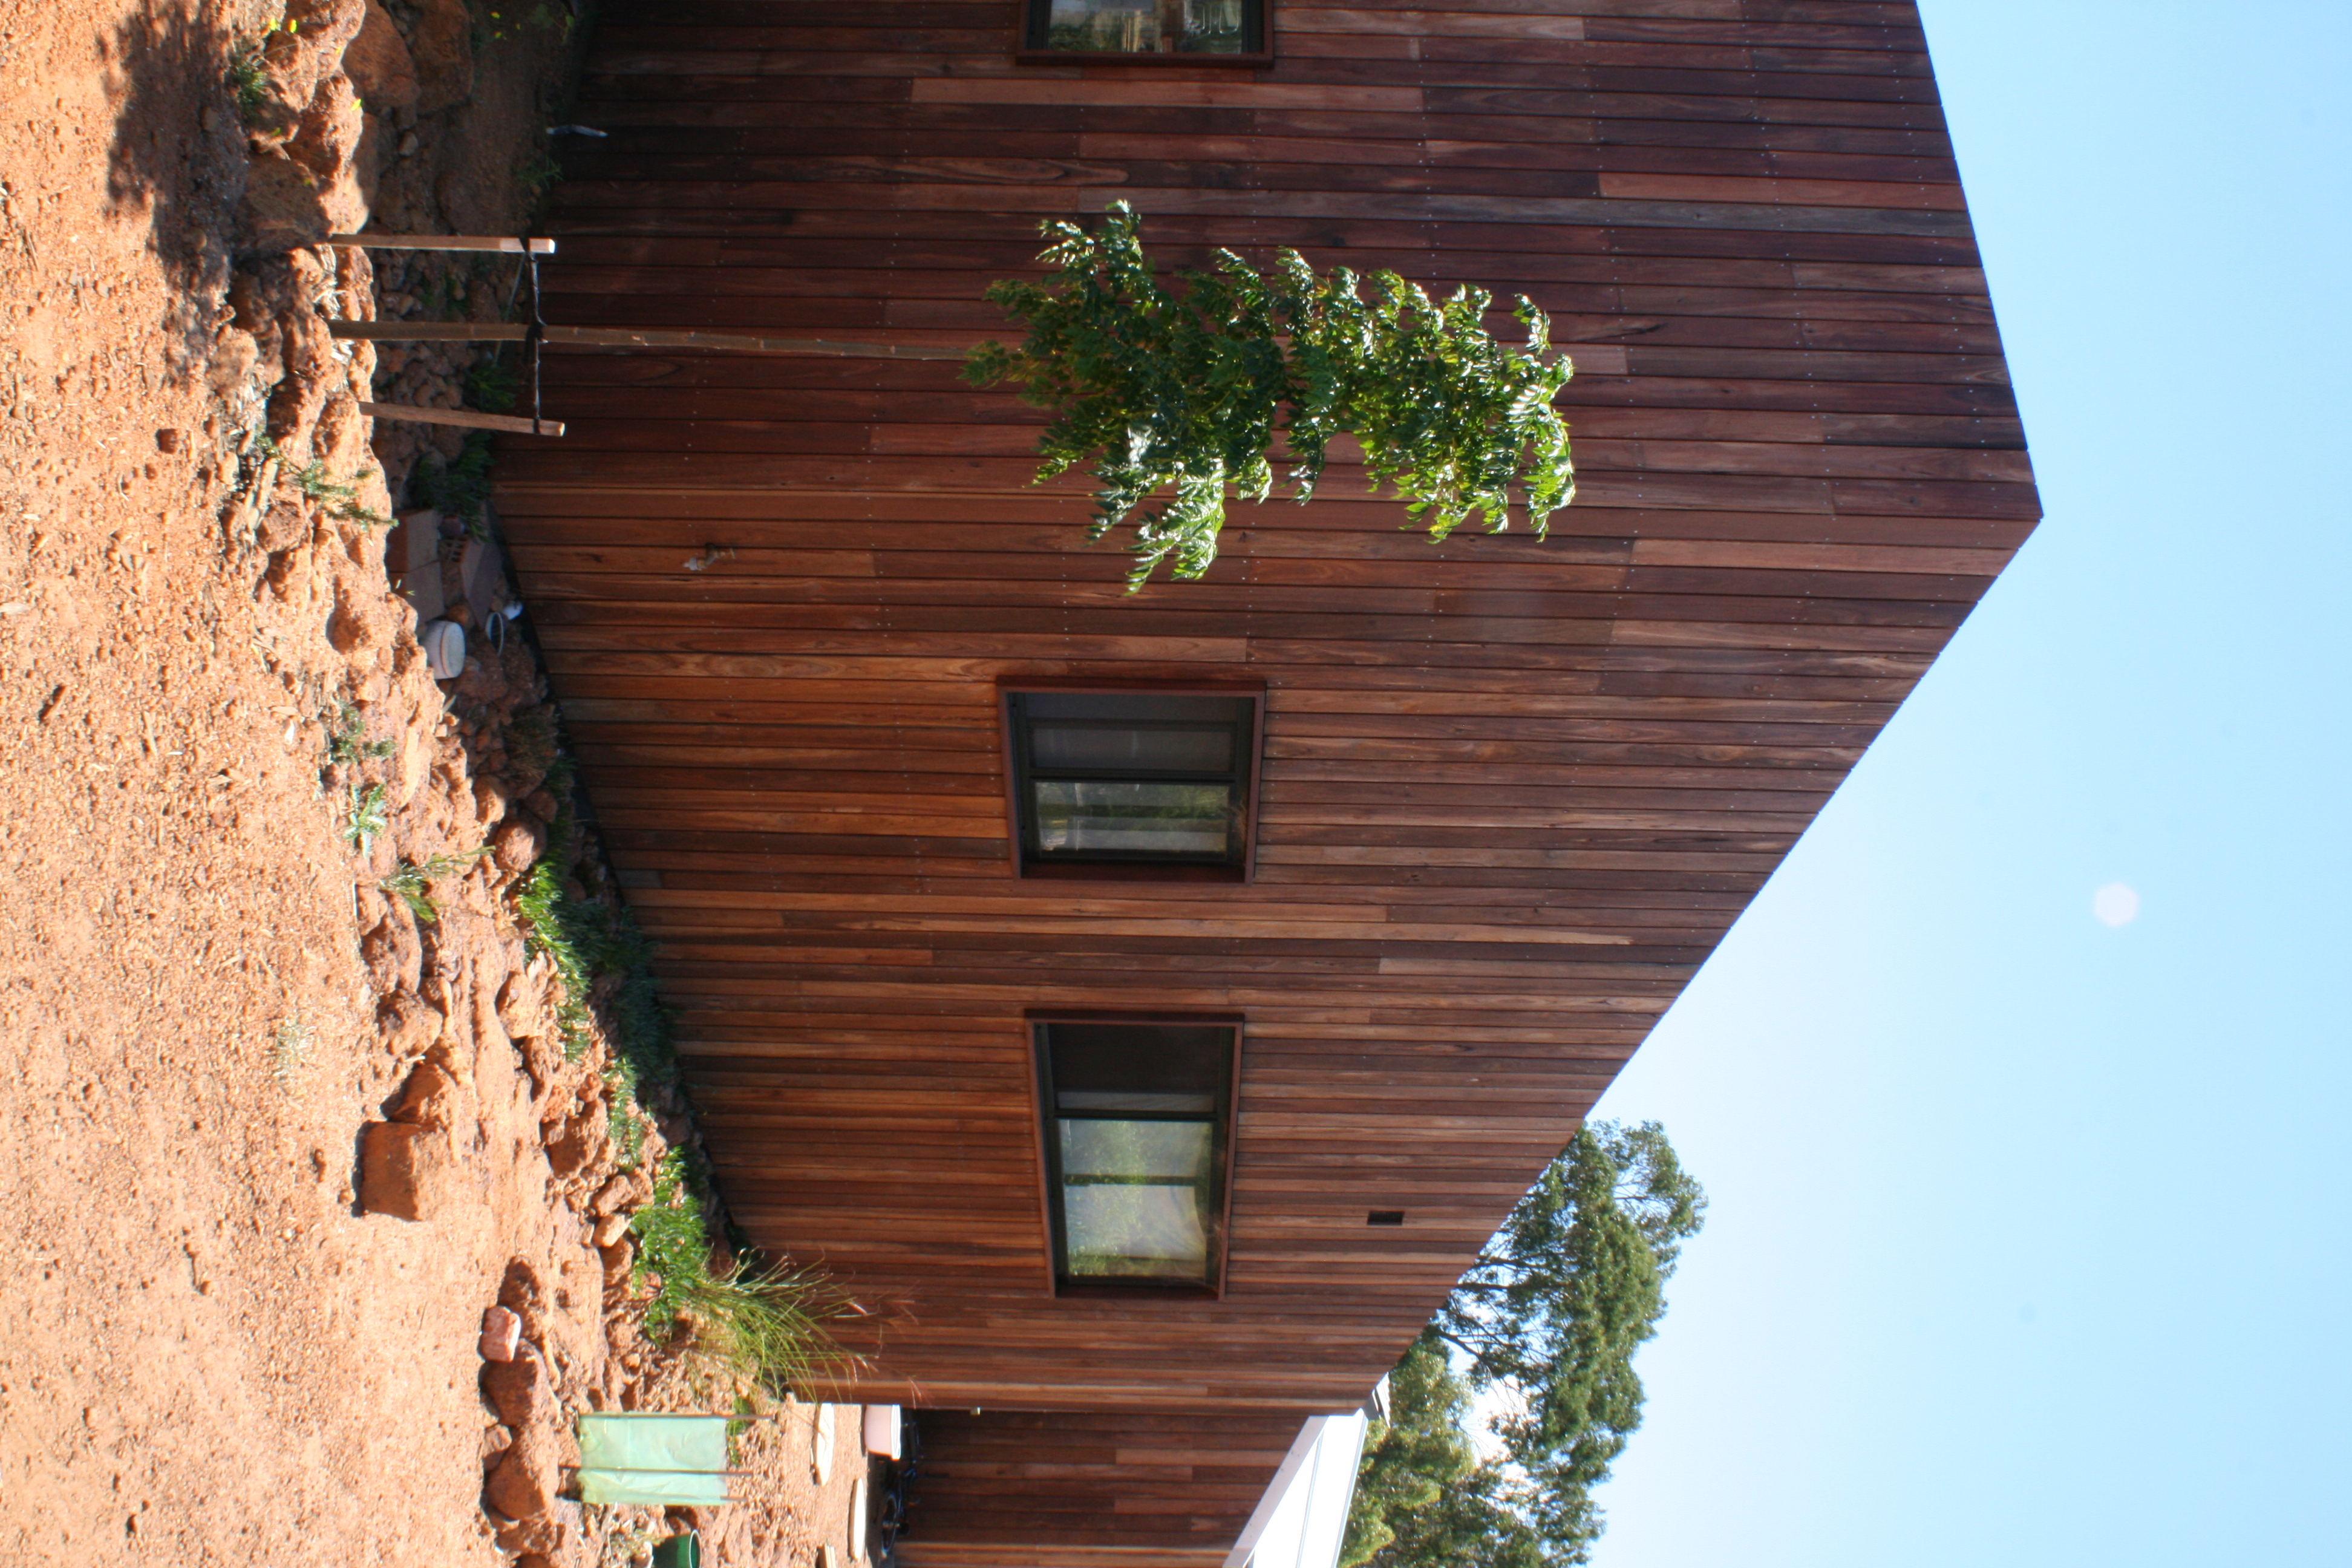 Architecture_House_Cowaramup_05